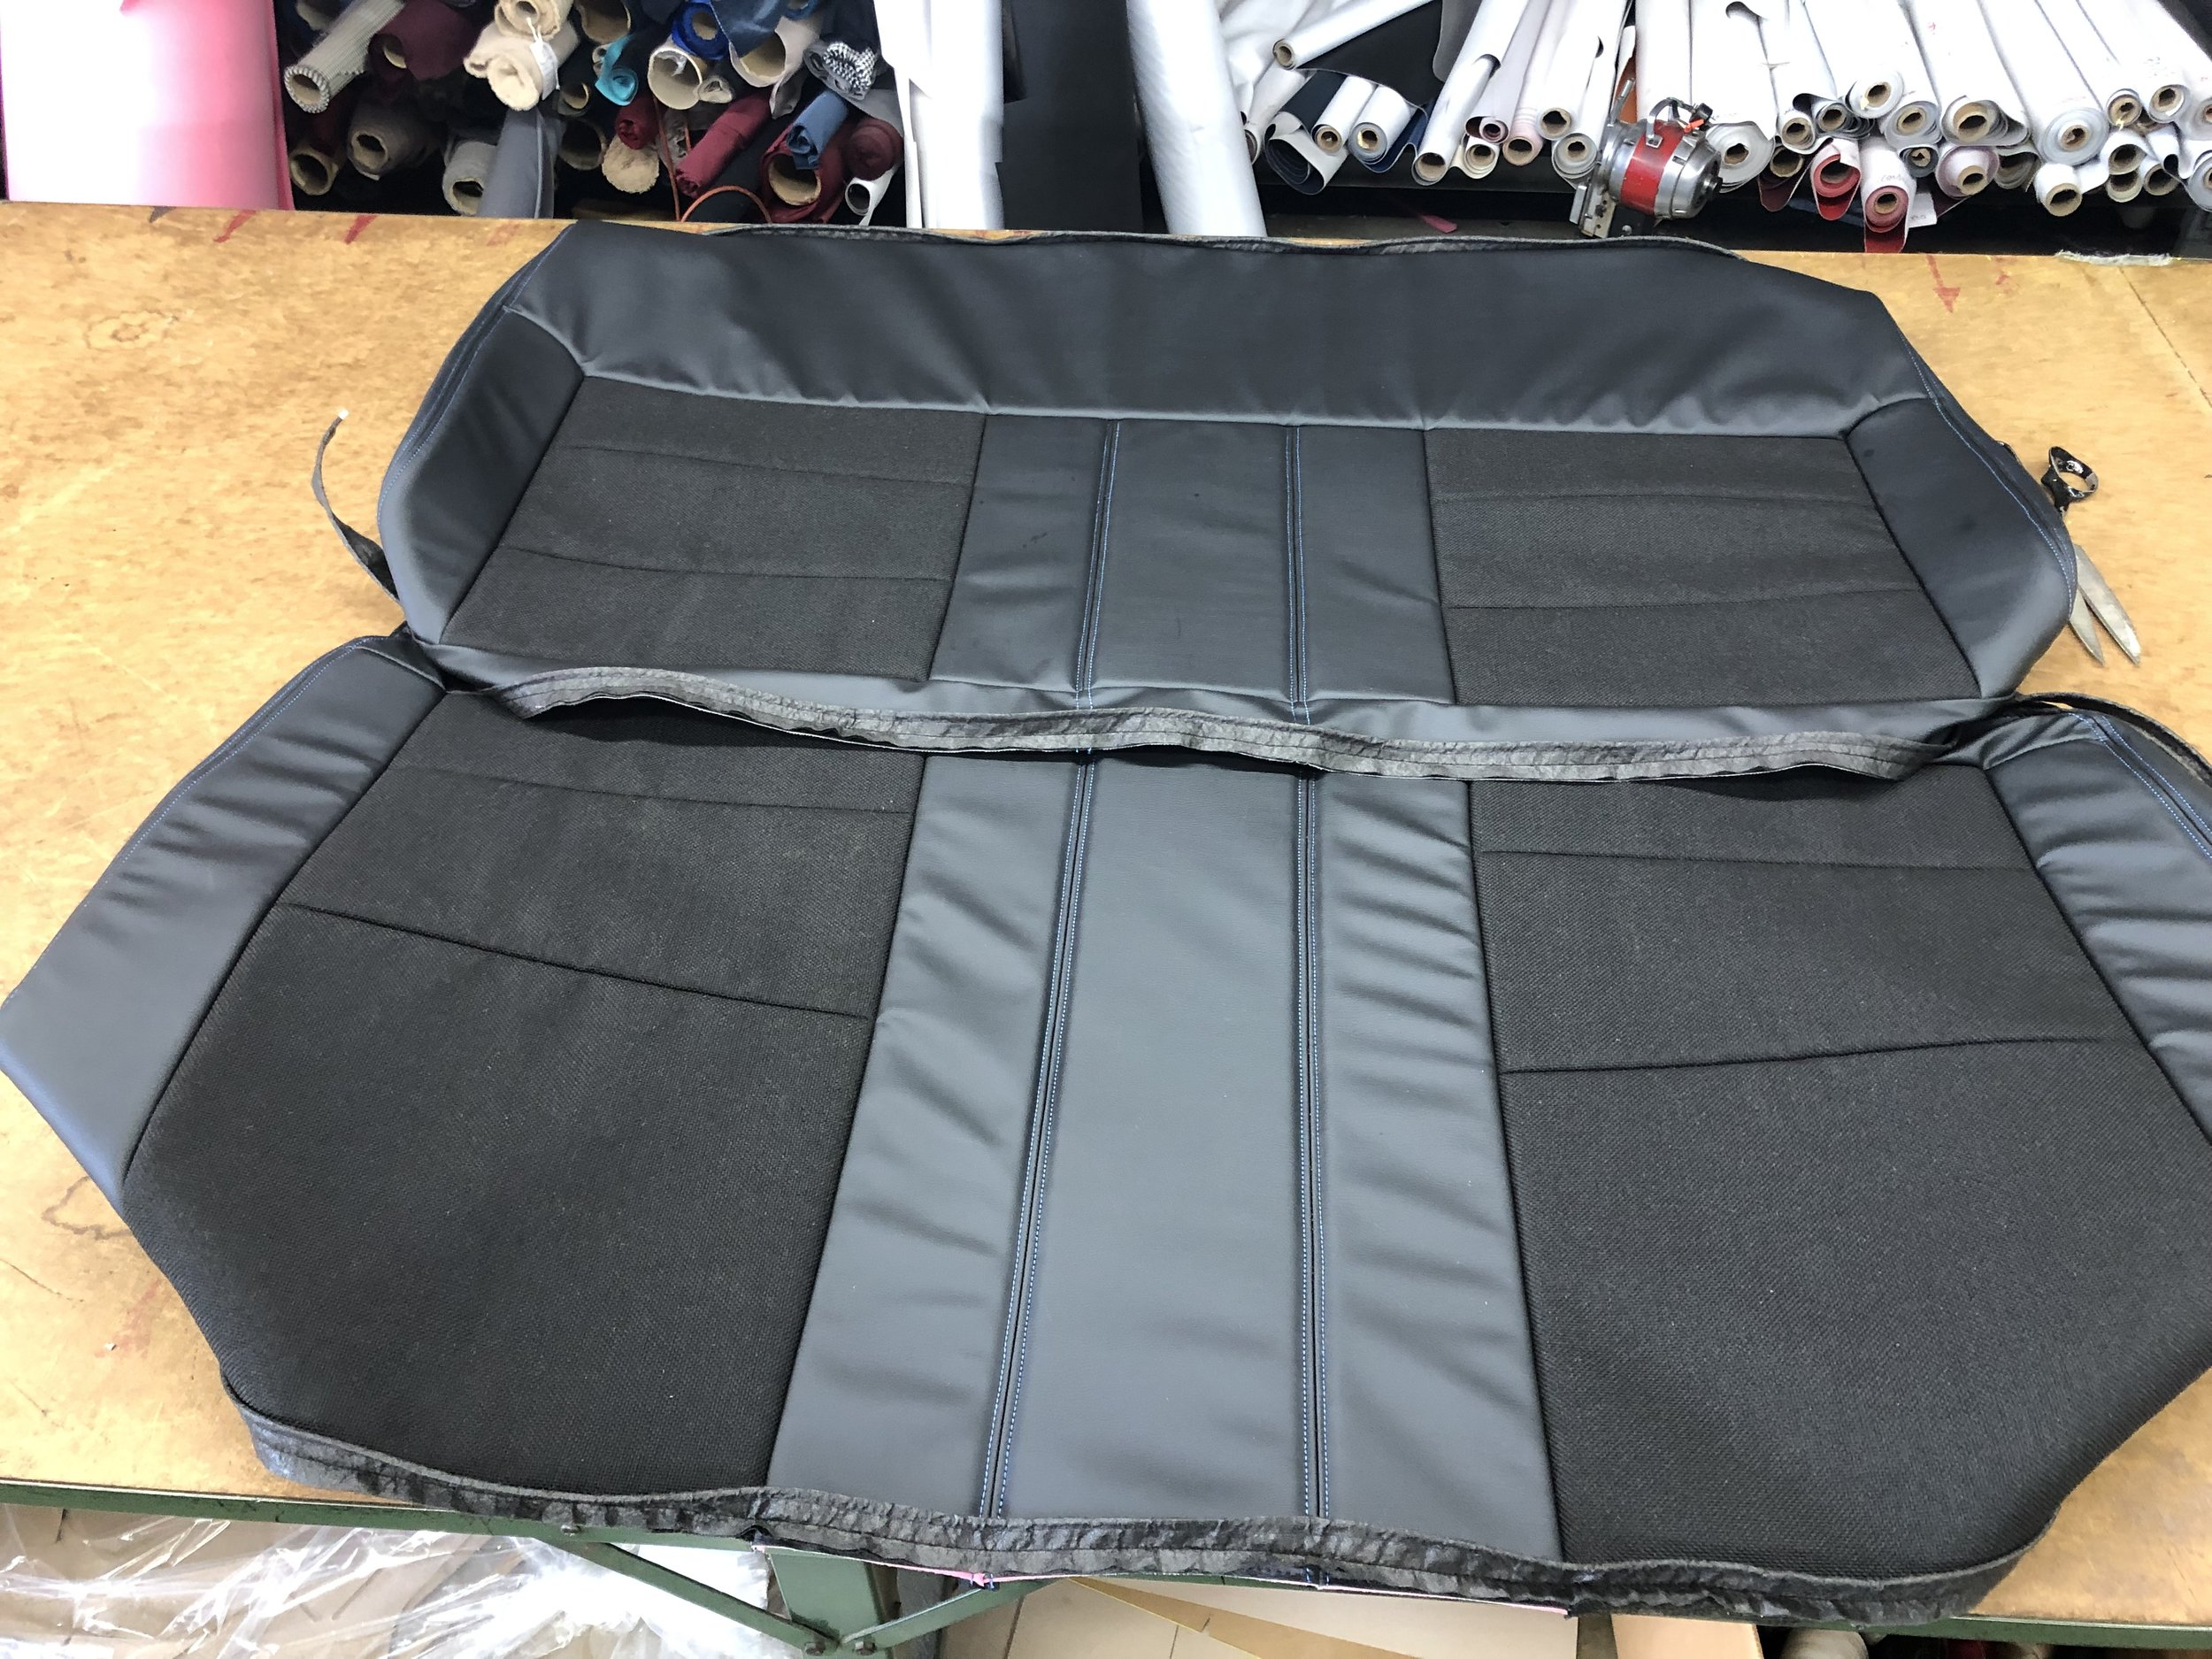 66 Chevelle Rear Seat Jennerjohn.jpg